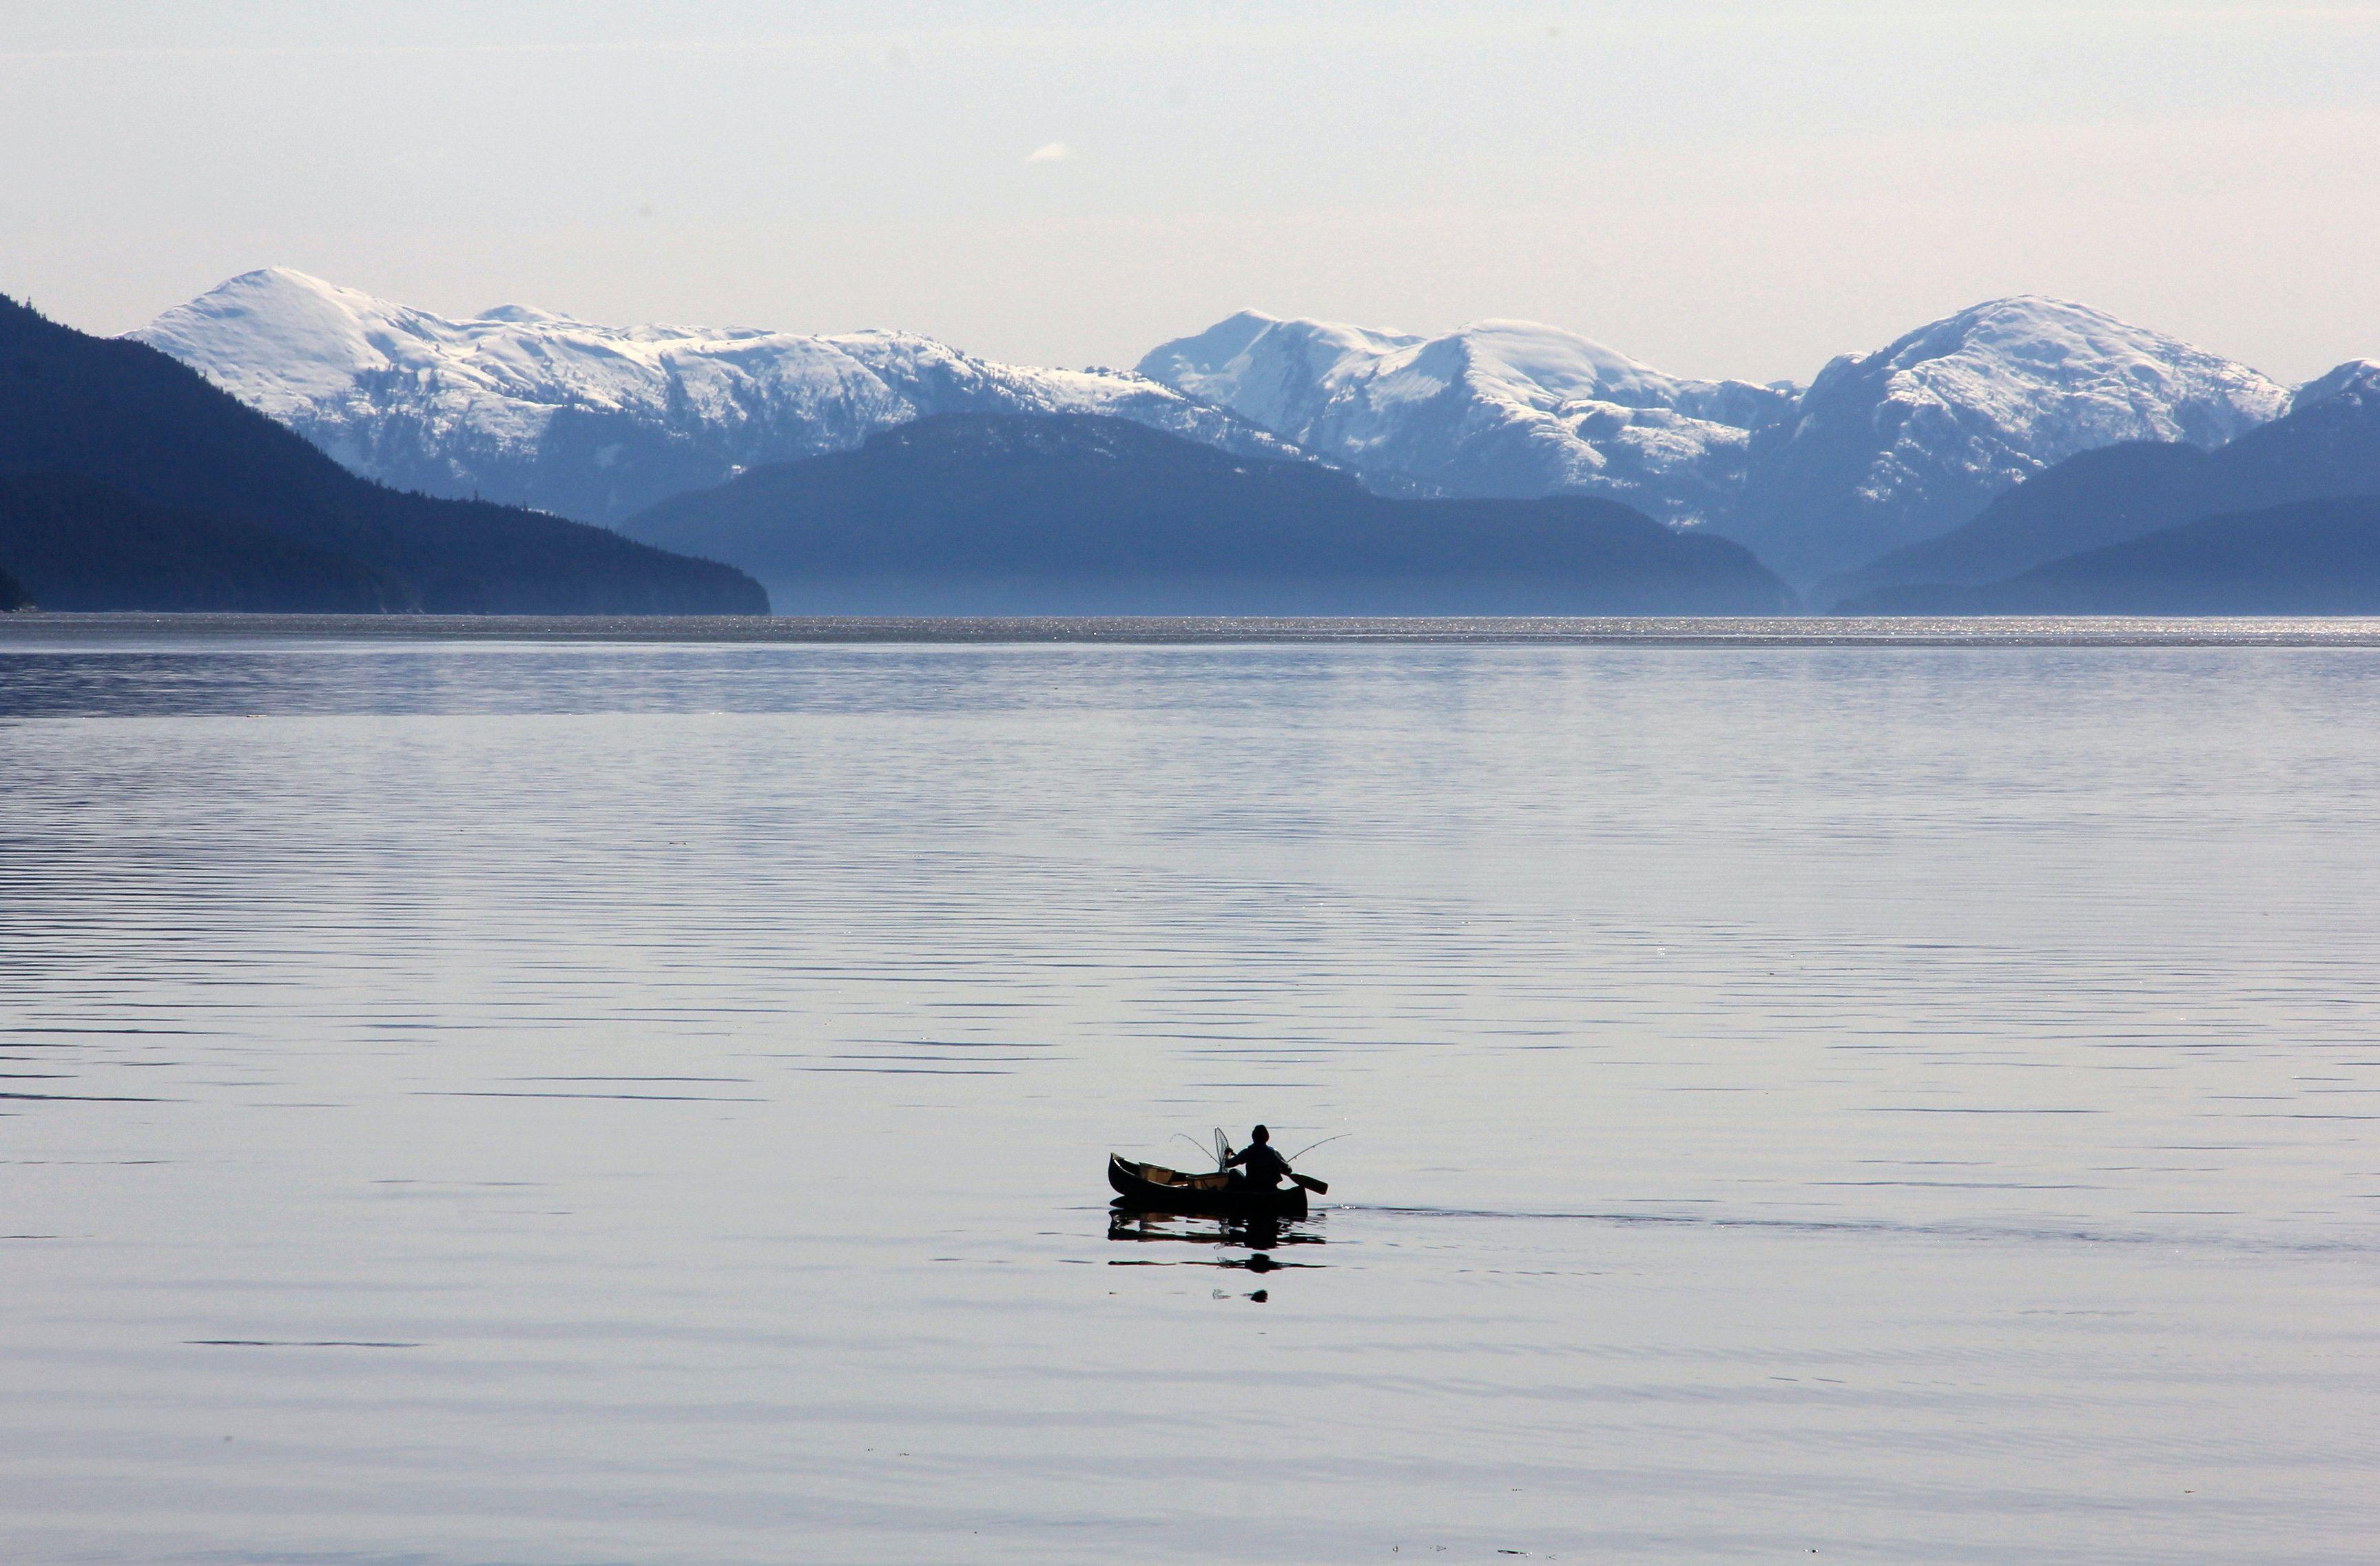 A Silver Lining in Canada's Dark Cloud?